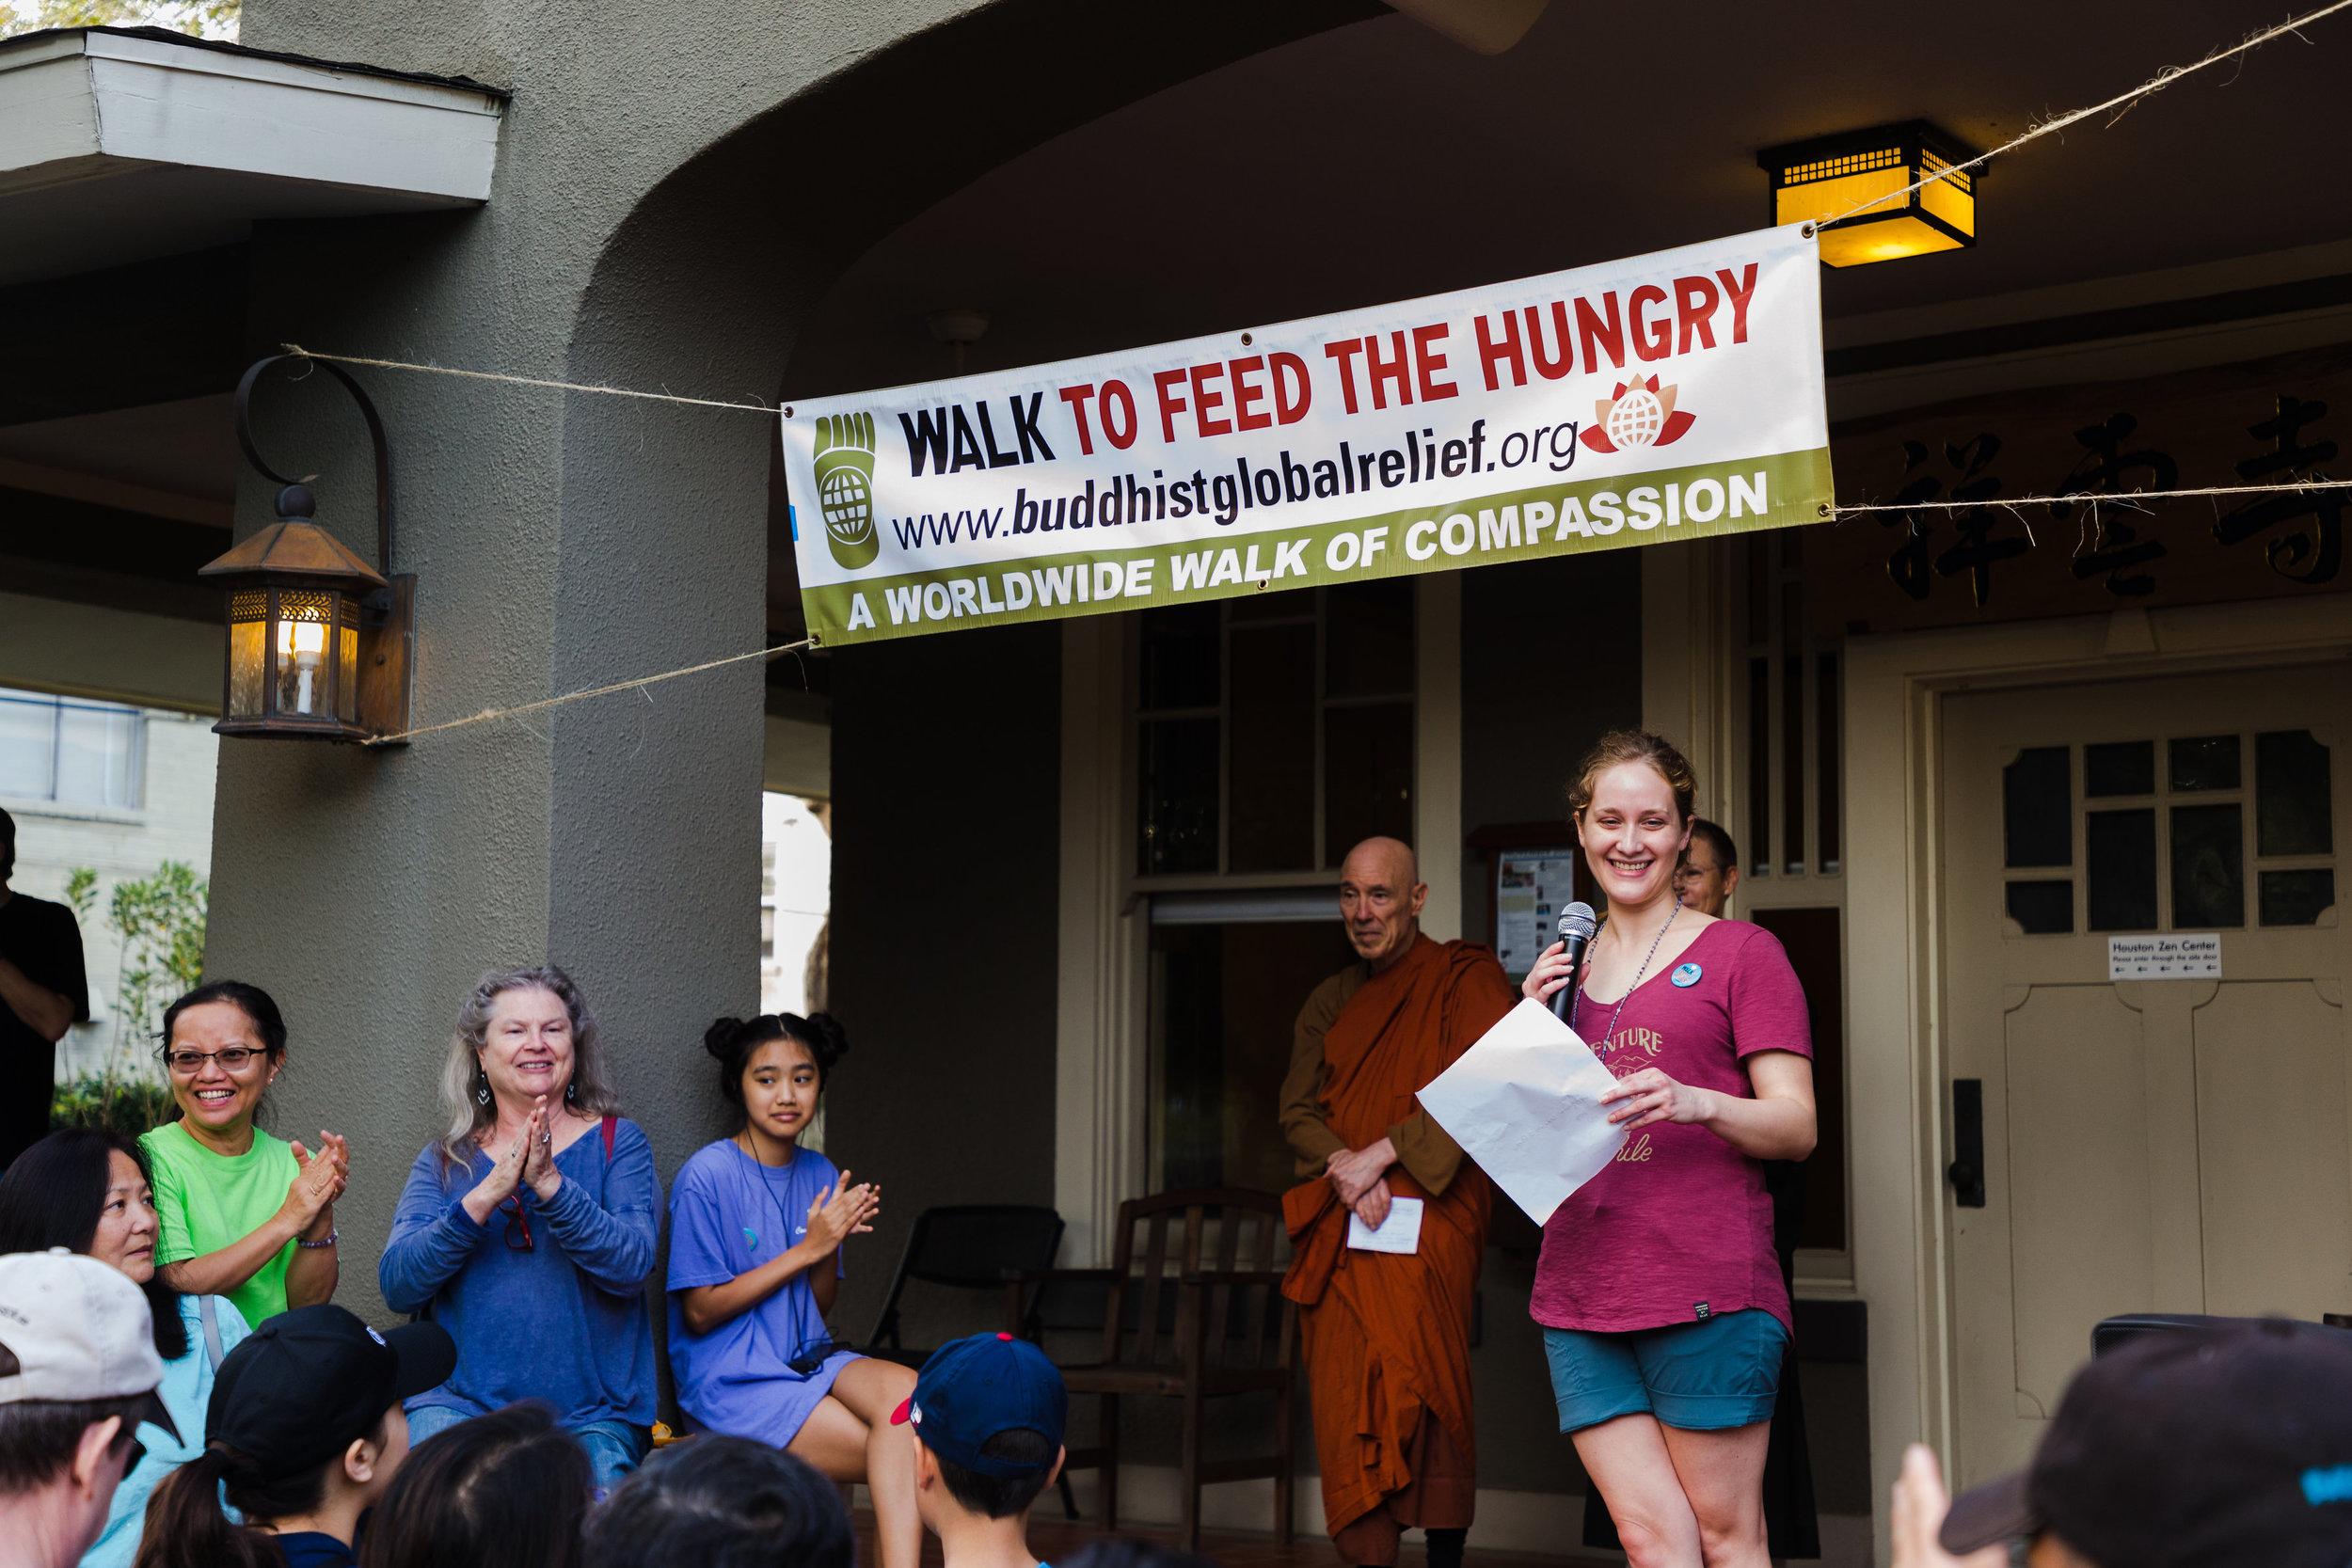 Bhikkhu-Bodhi-Global-Relief-Houston-Zen-Walk-17.jpg